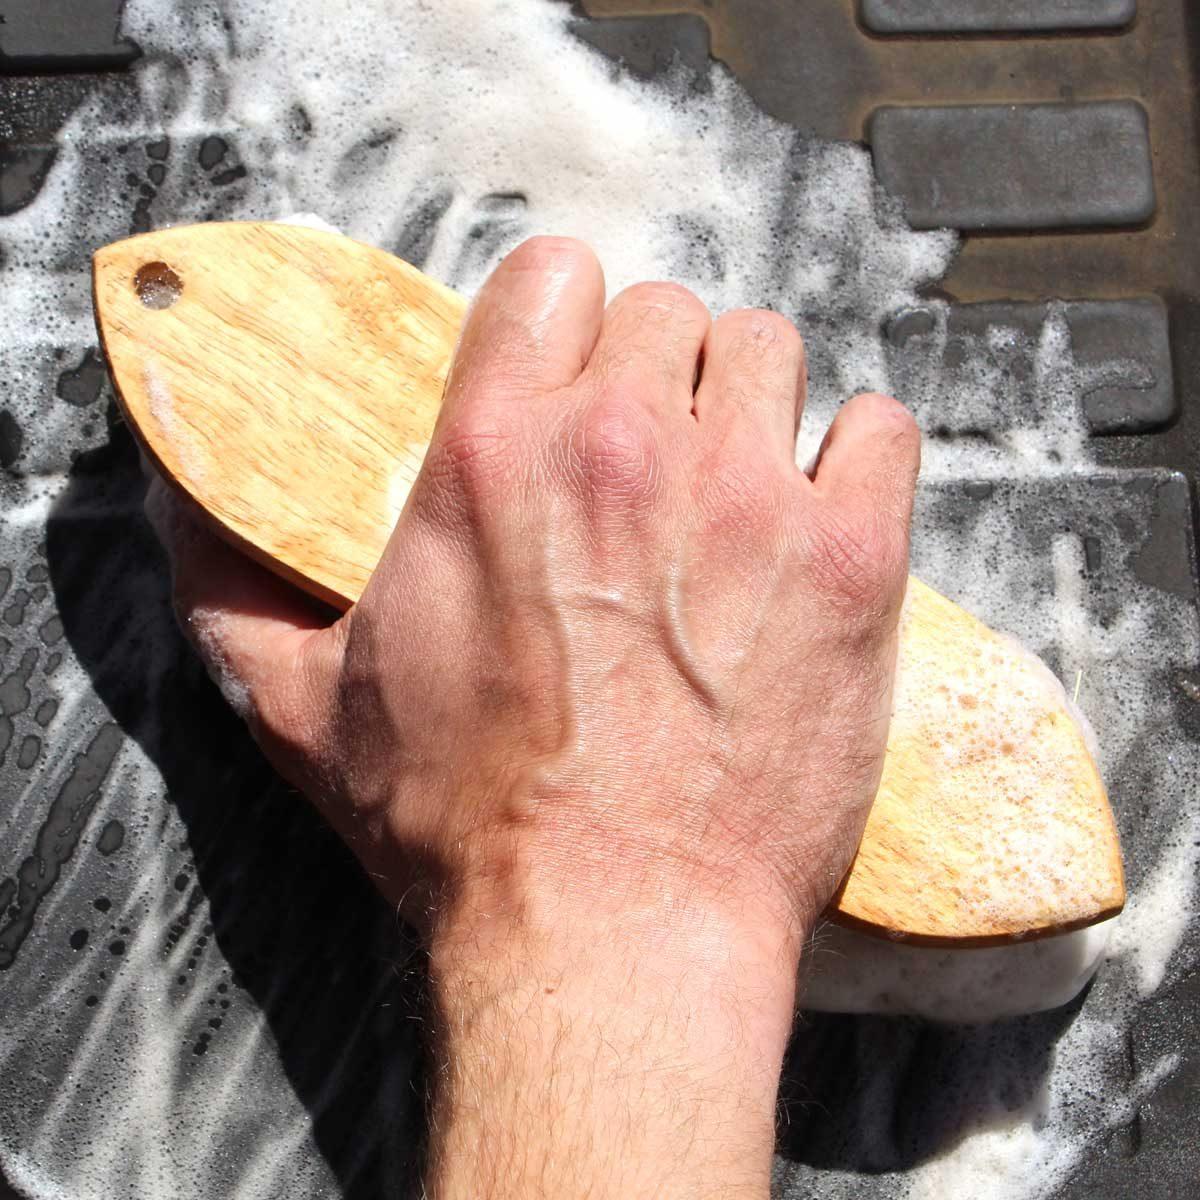 Step 3: Scrub With Soap